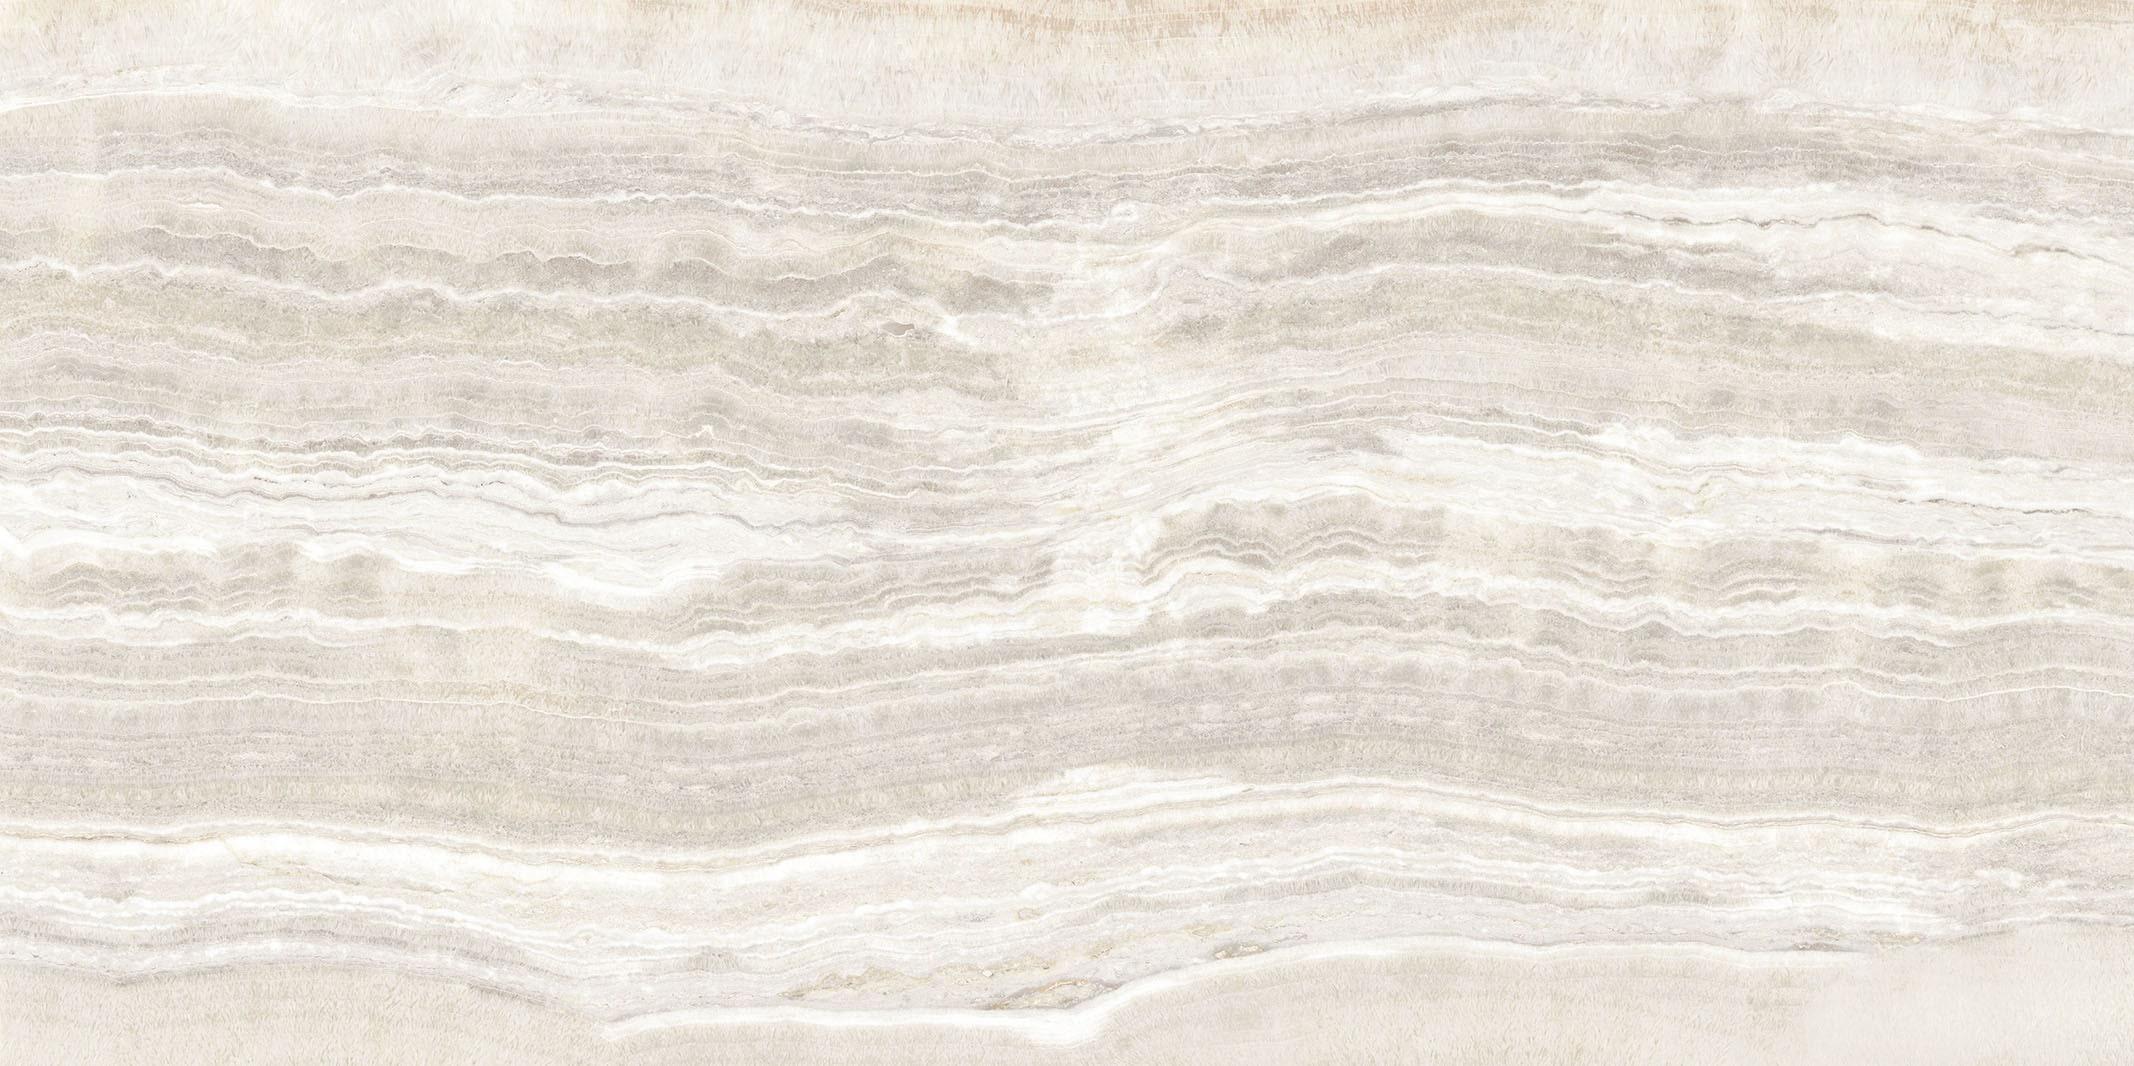 Onyx of Cerim Sand Glossy 10mm 30 x 60